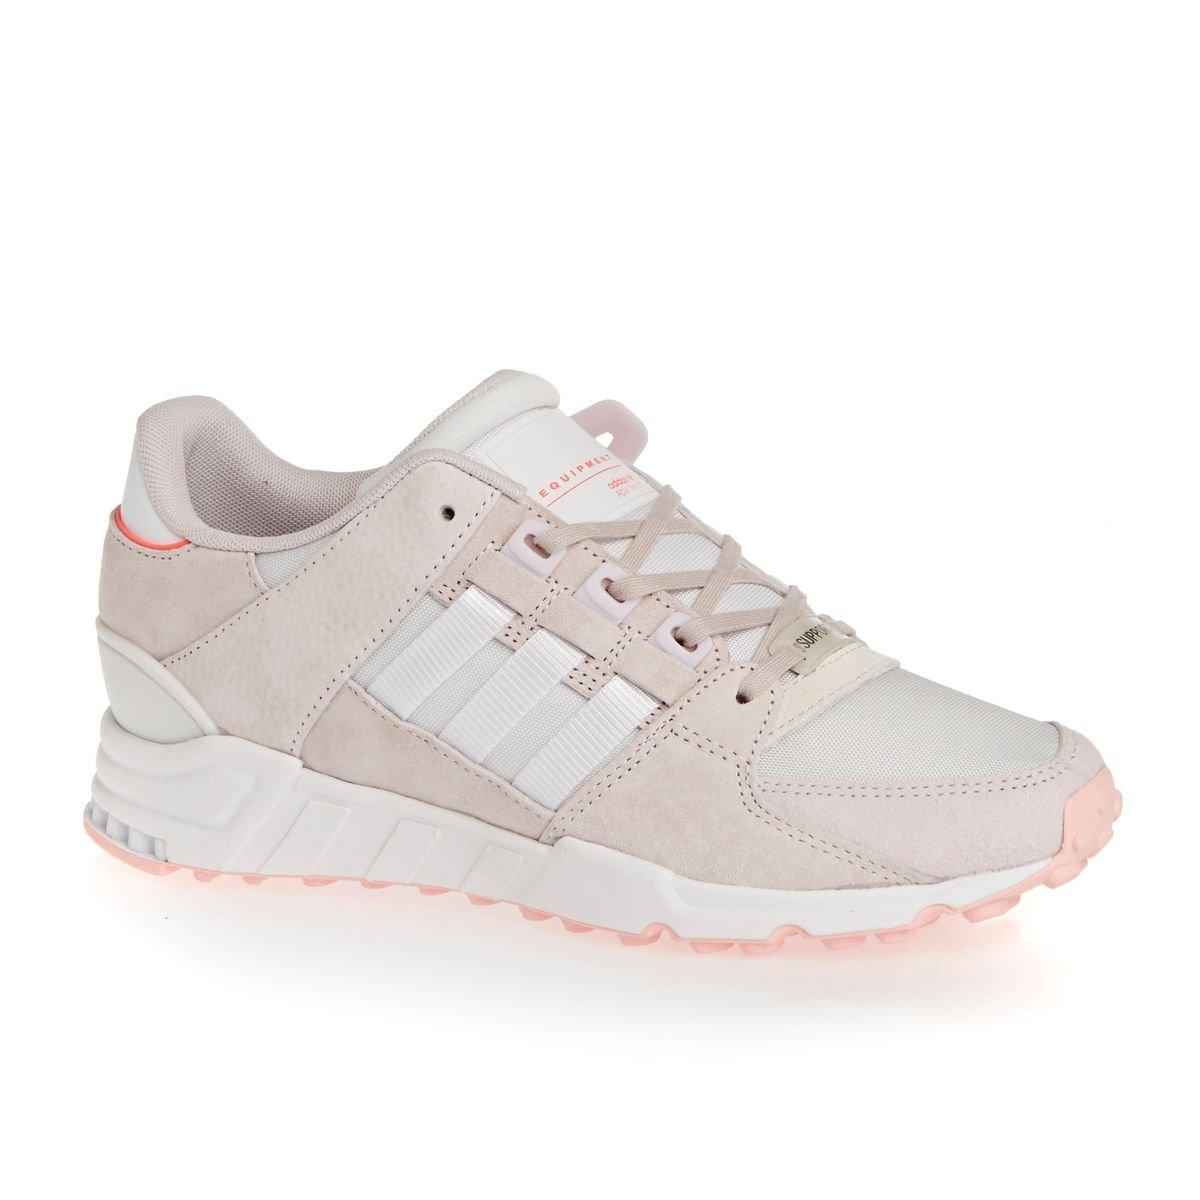 Adidas Damen EQT Support Turnschuhe Rosa 36 2 3 EU